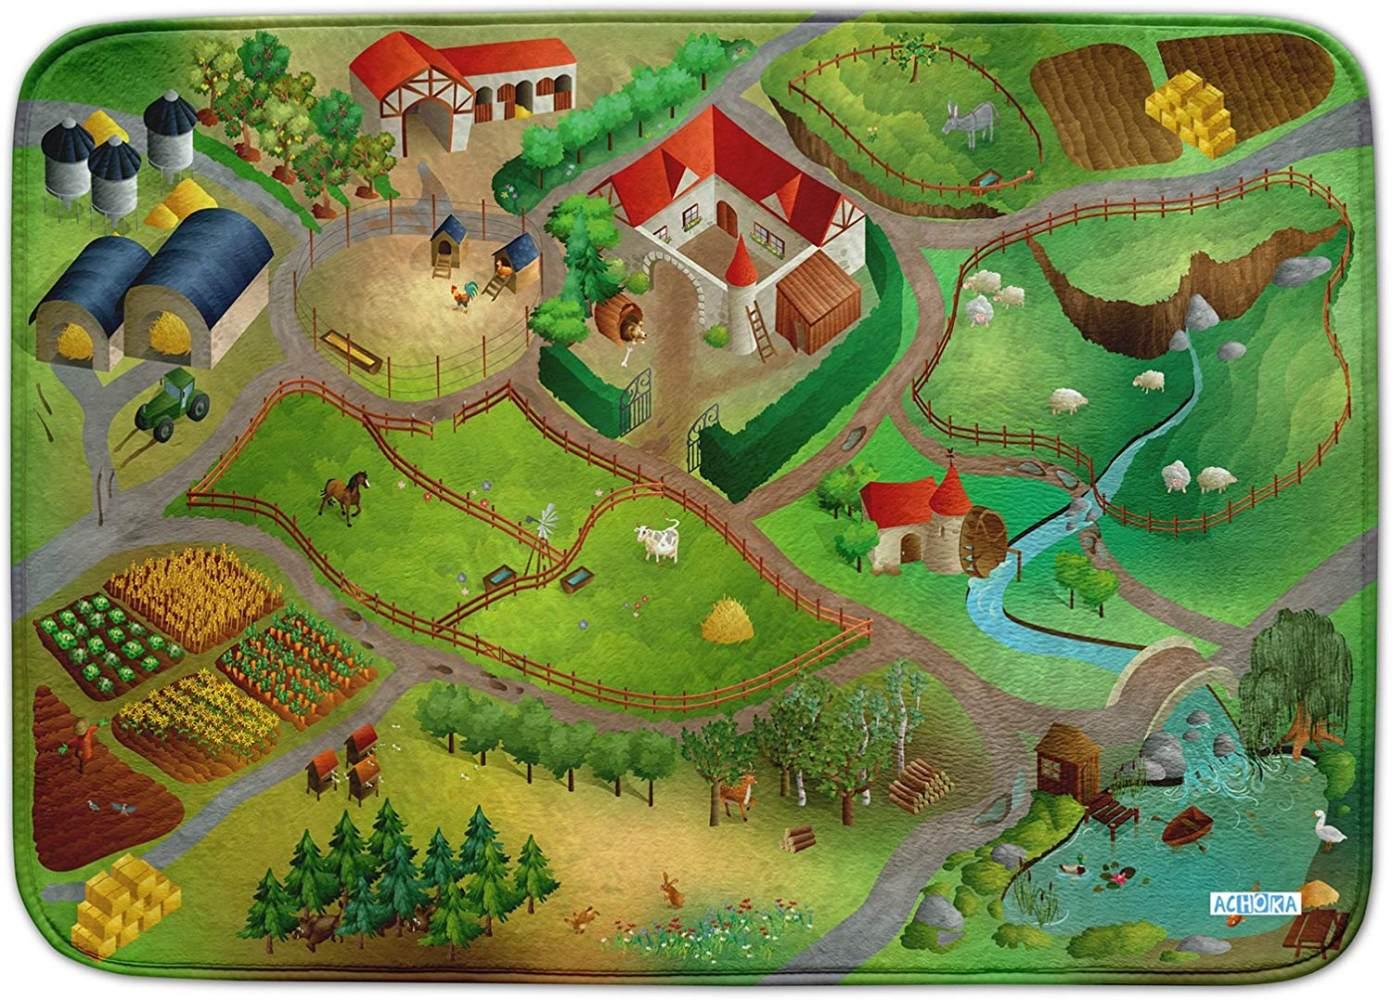 House Of Kids 86005-E3 - Playmat Ultra Soft Ferme Connect, 130 x 180 cm Bild 1